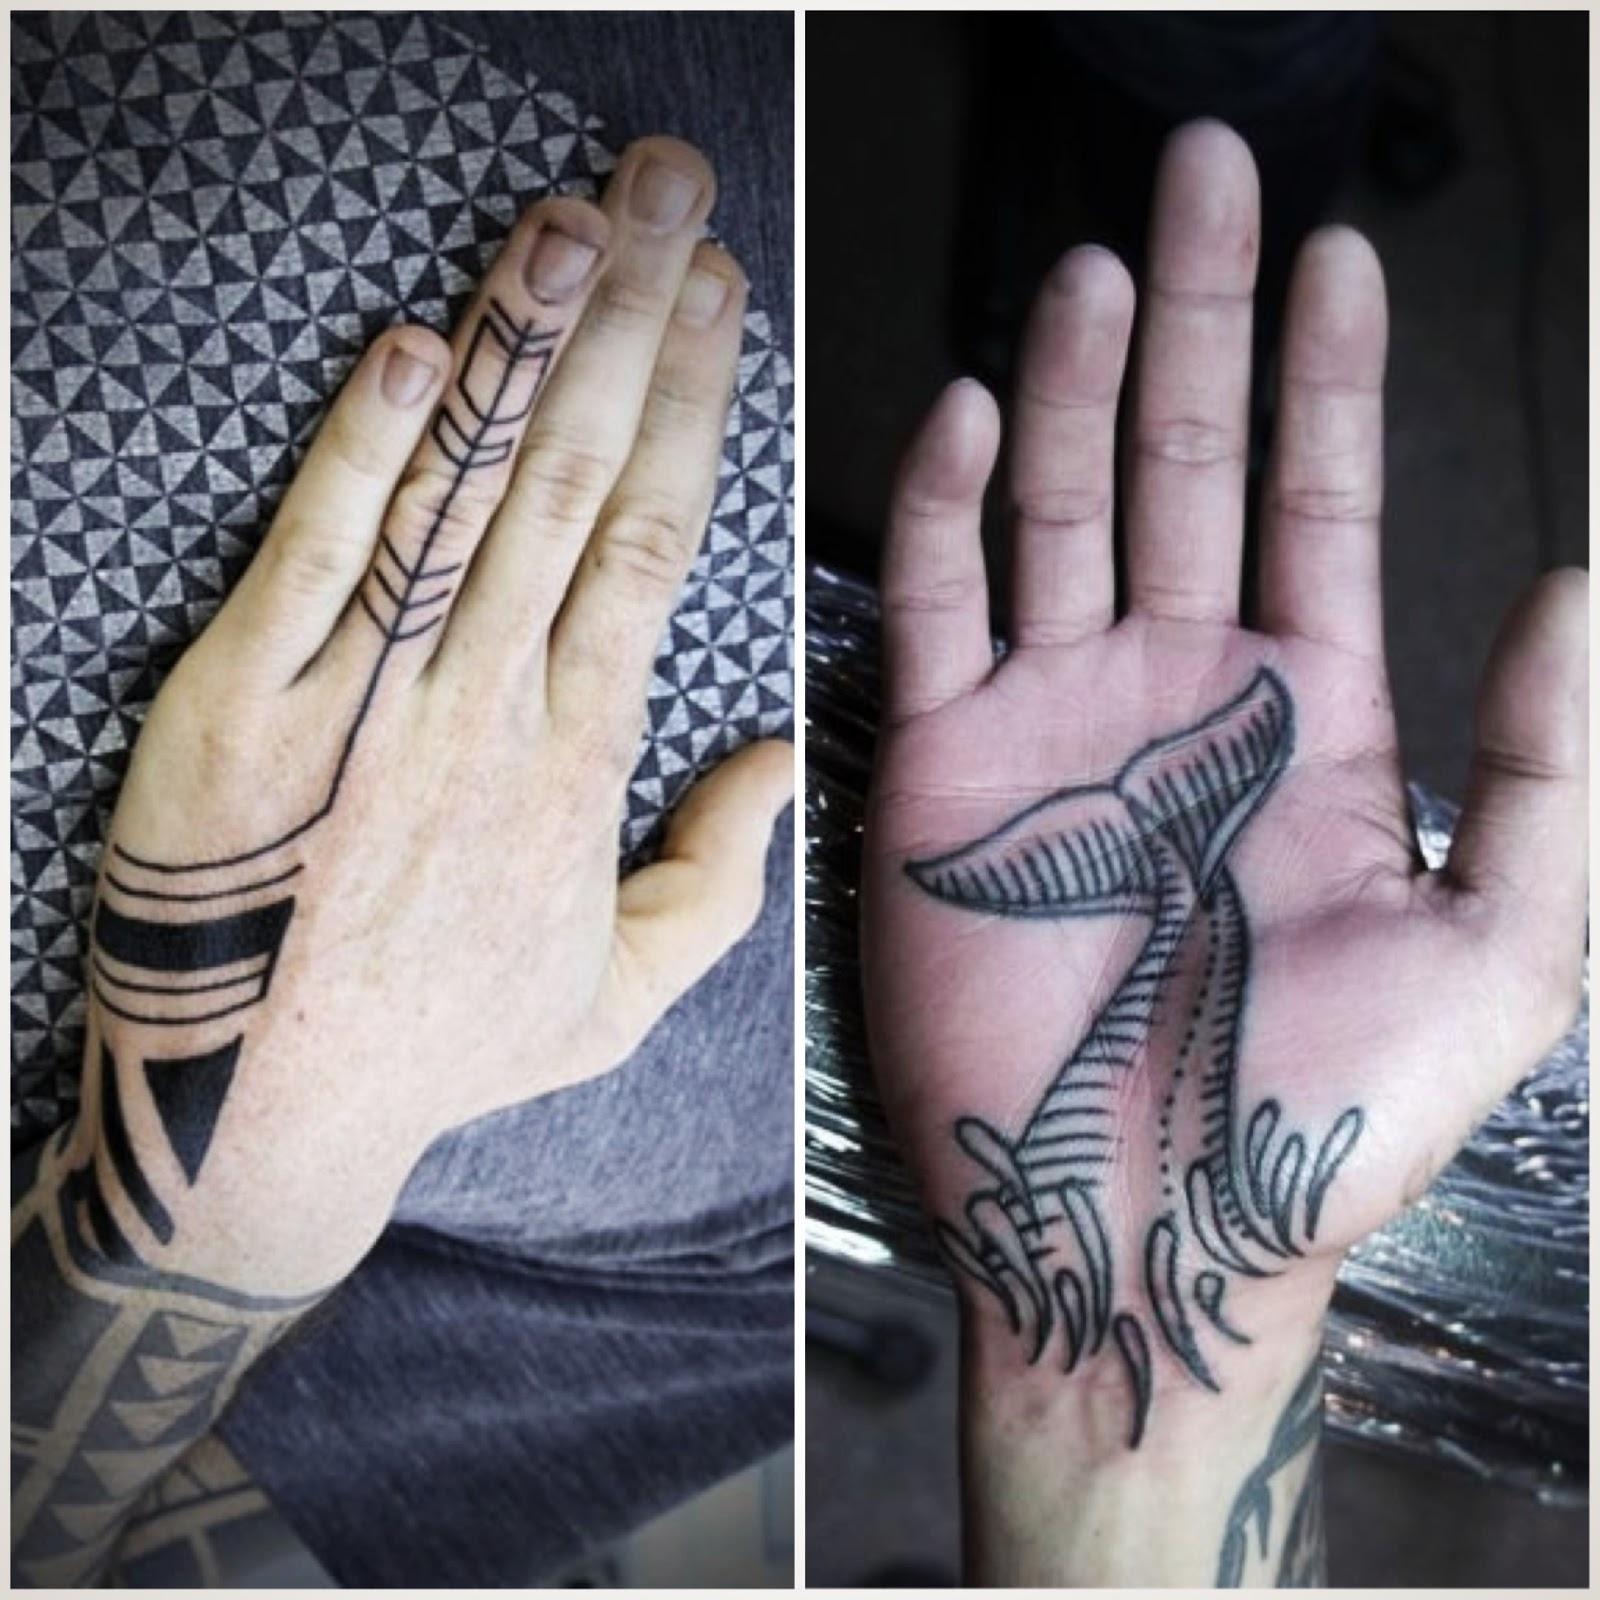 tattoo-palma-mao